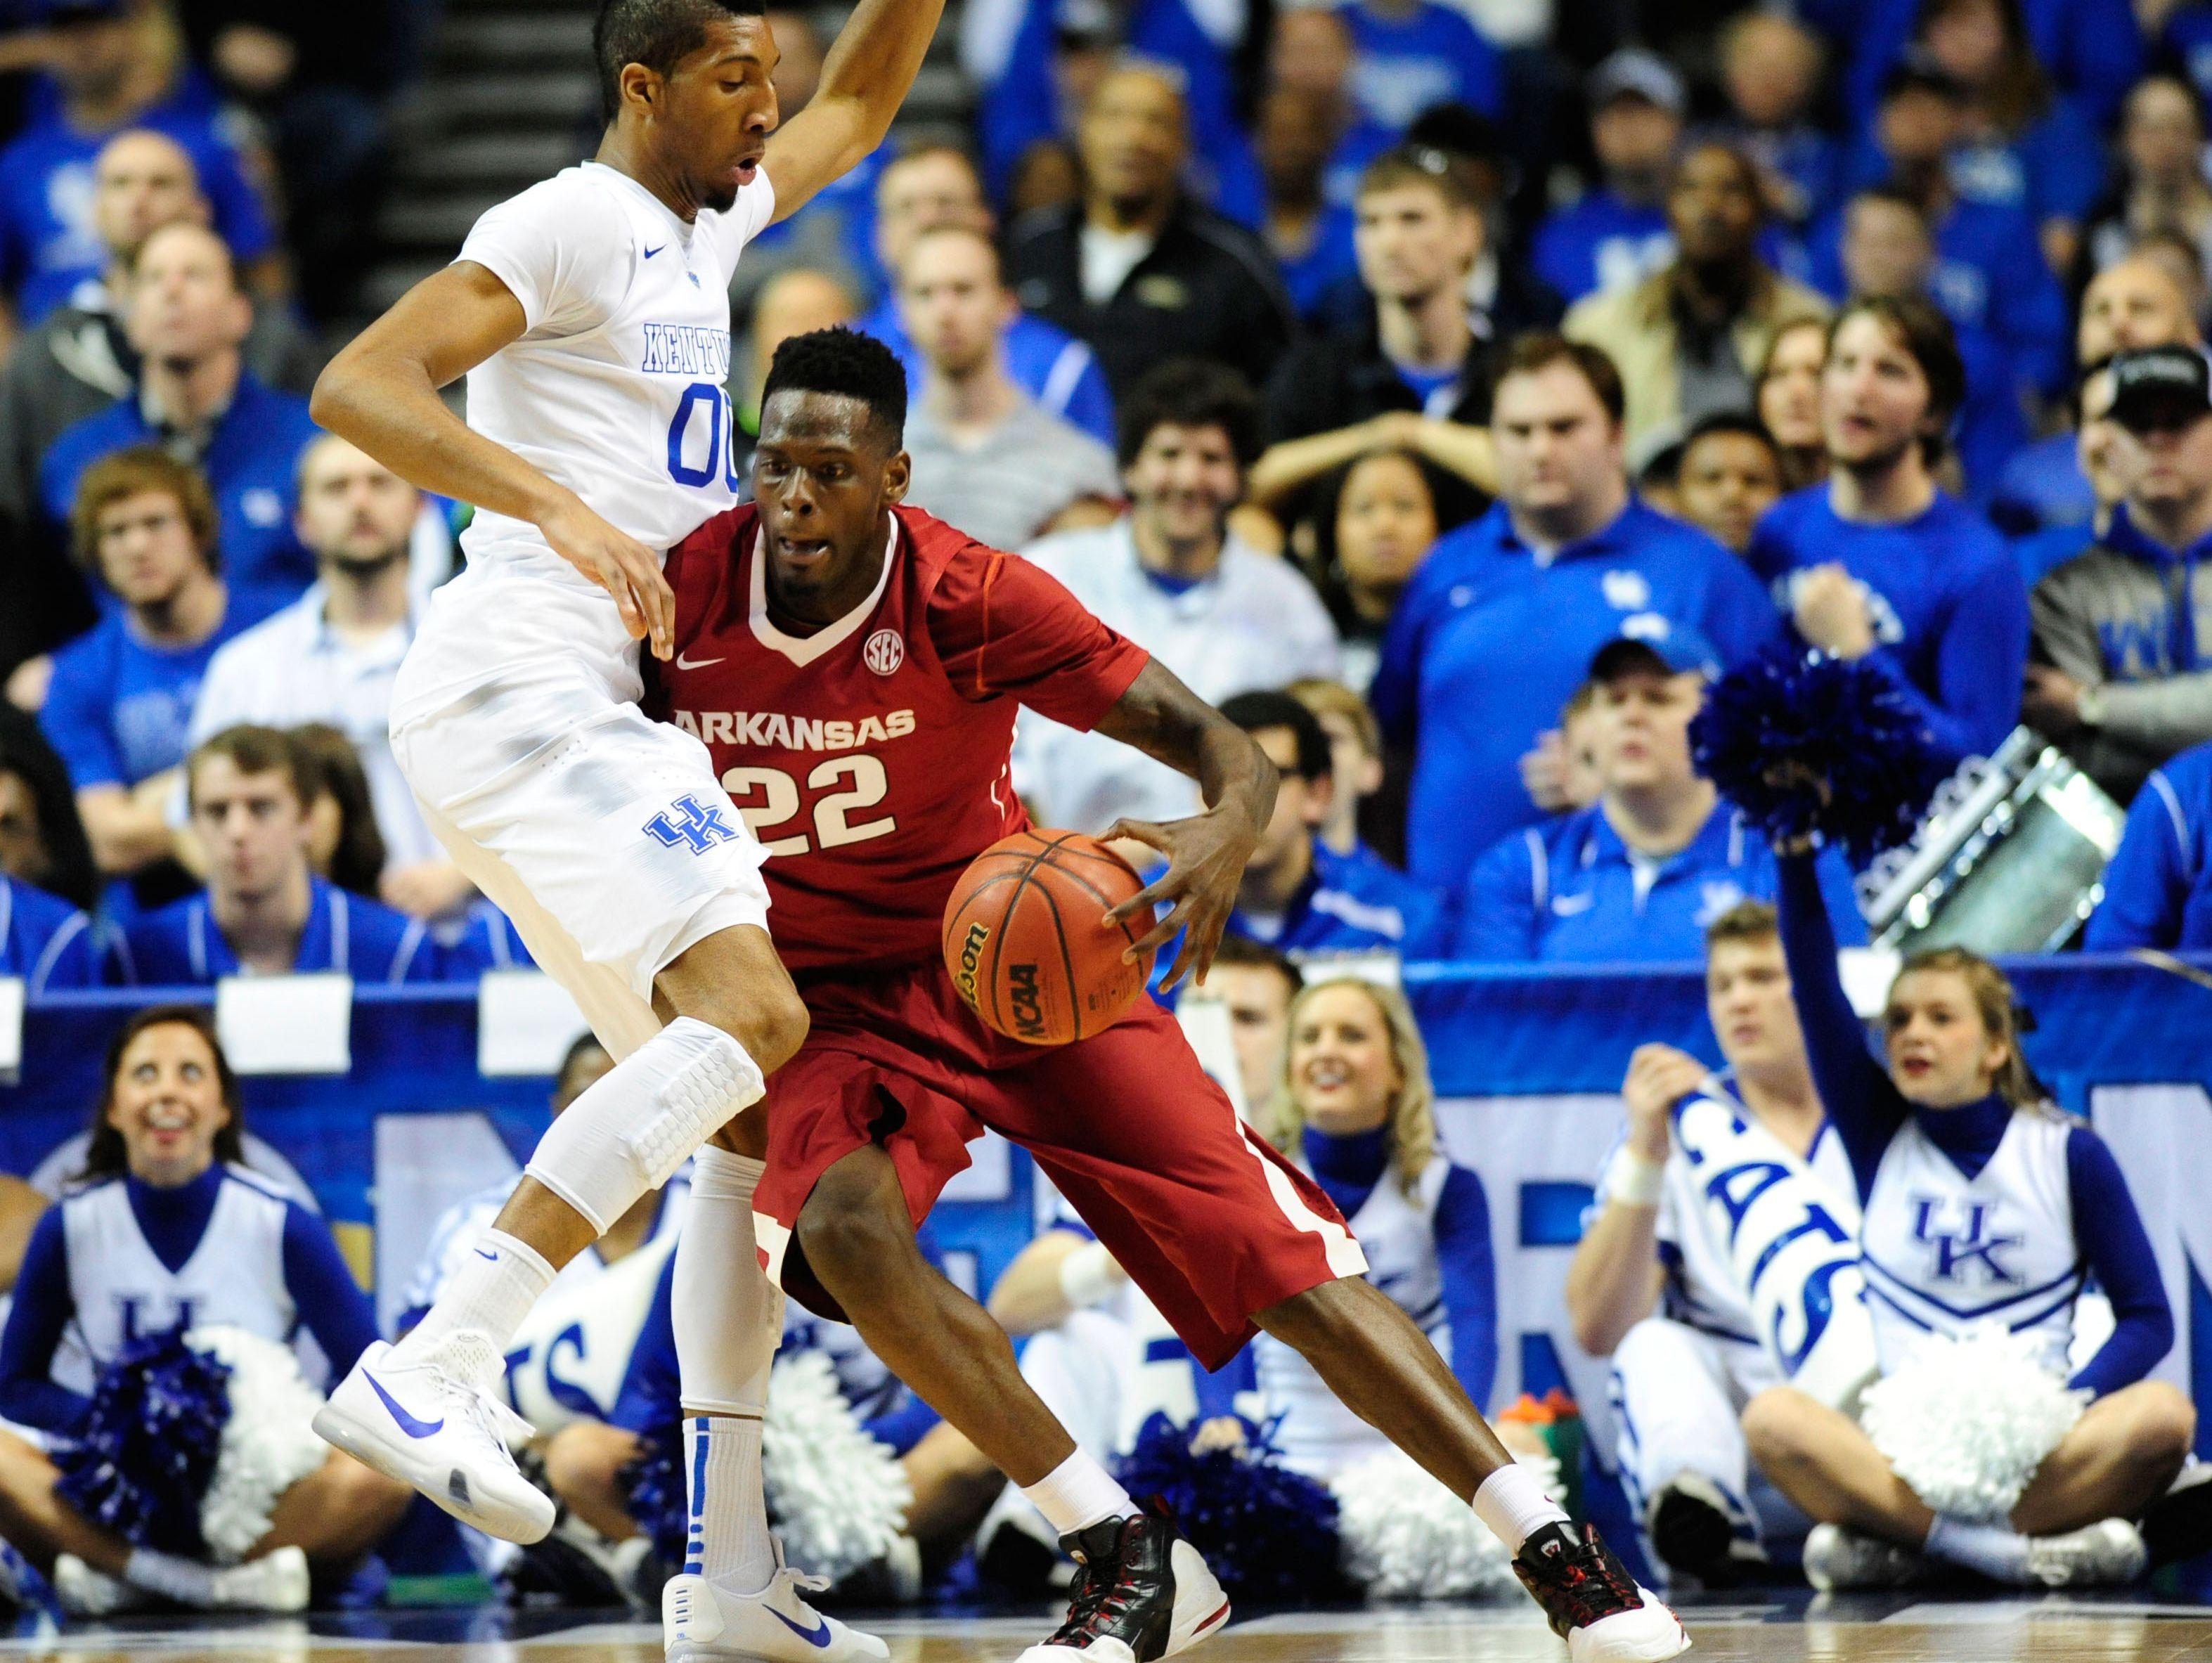 Williams not returning to men's basketball program | USA ...